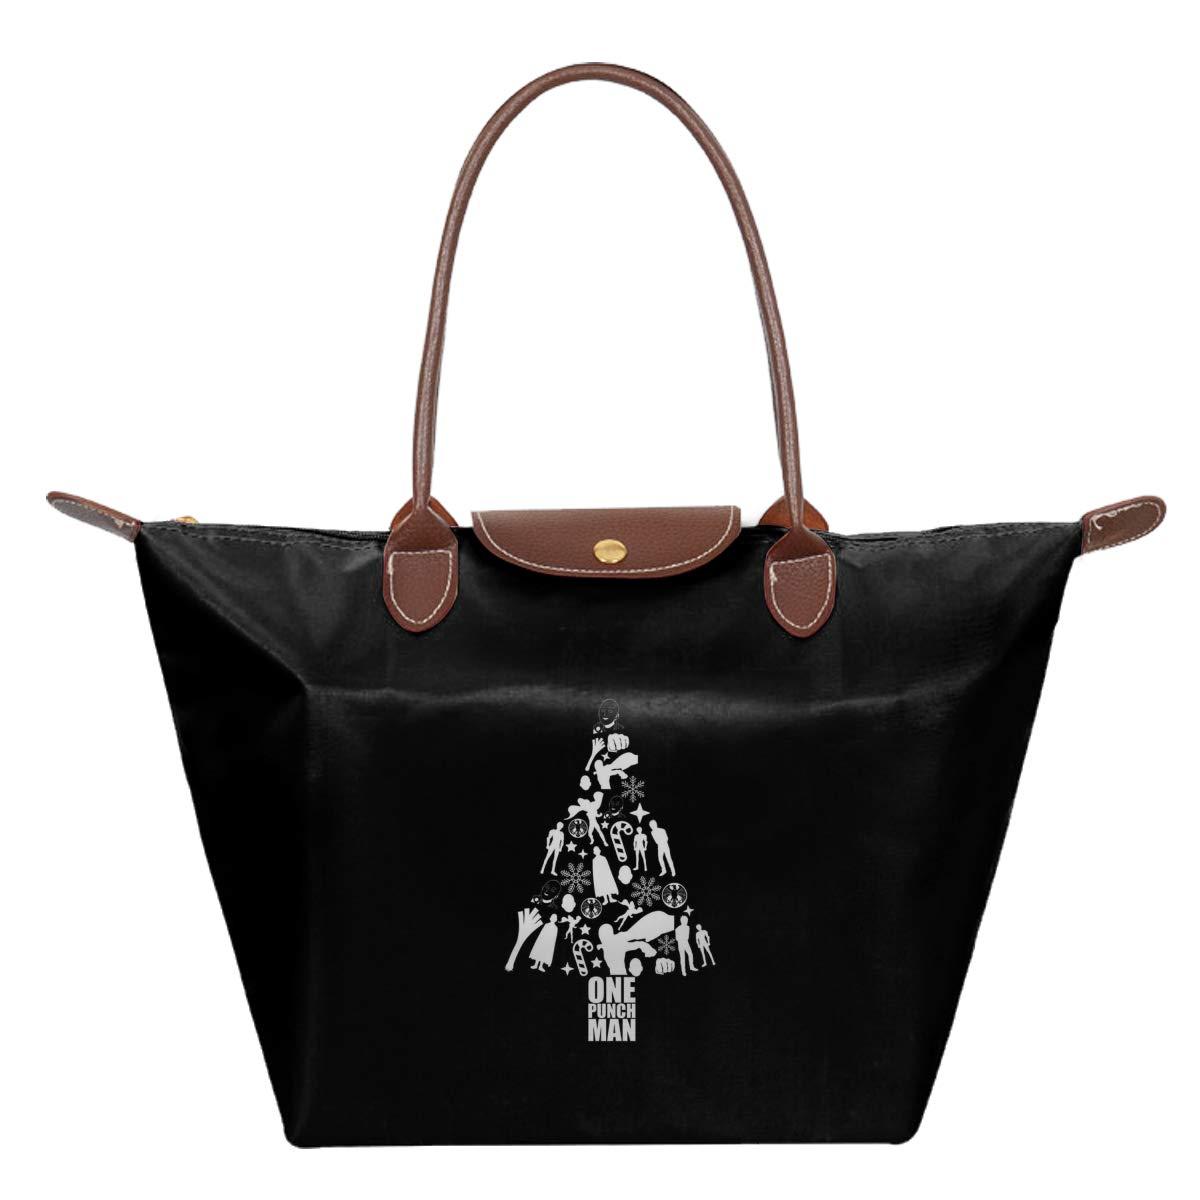 One Punch Man Christmas Silhouette Pattern Waterproof Leather Folded Messenger Nylon Bag Travel Tote Hopping Folding School Handbags